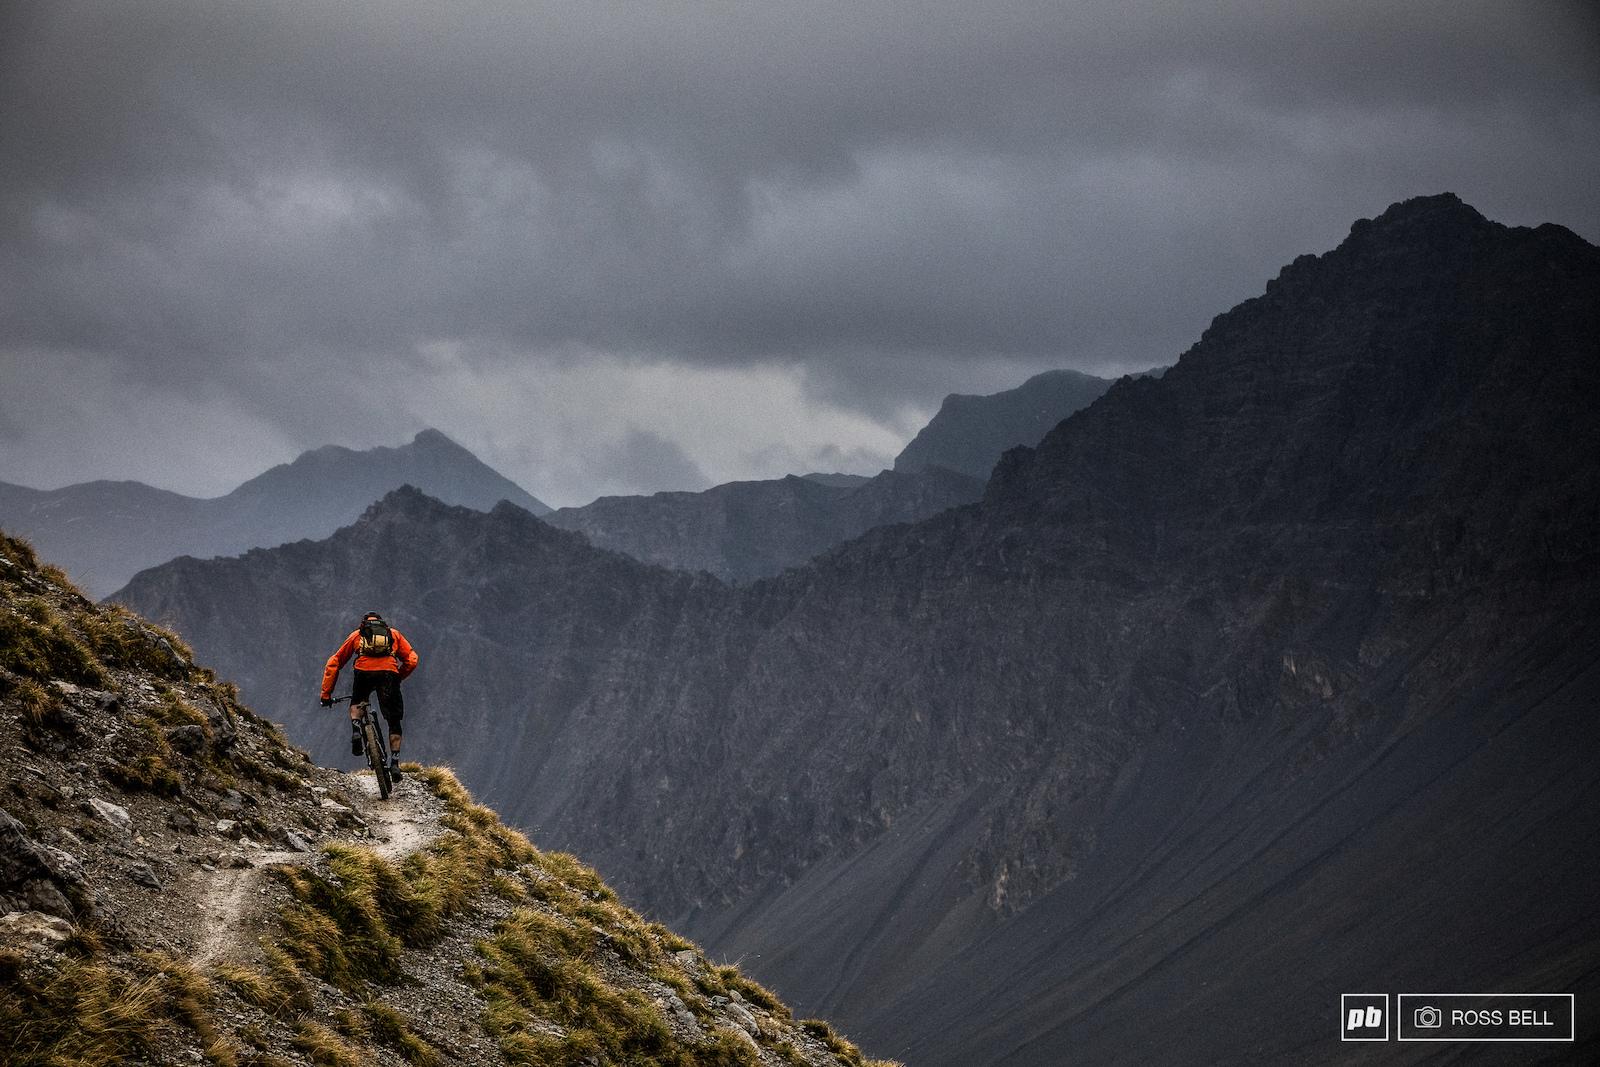 Thomas Vanderham pedalling through the peaks above Lenzerheide Switzerland.